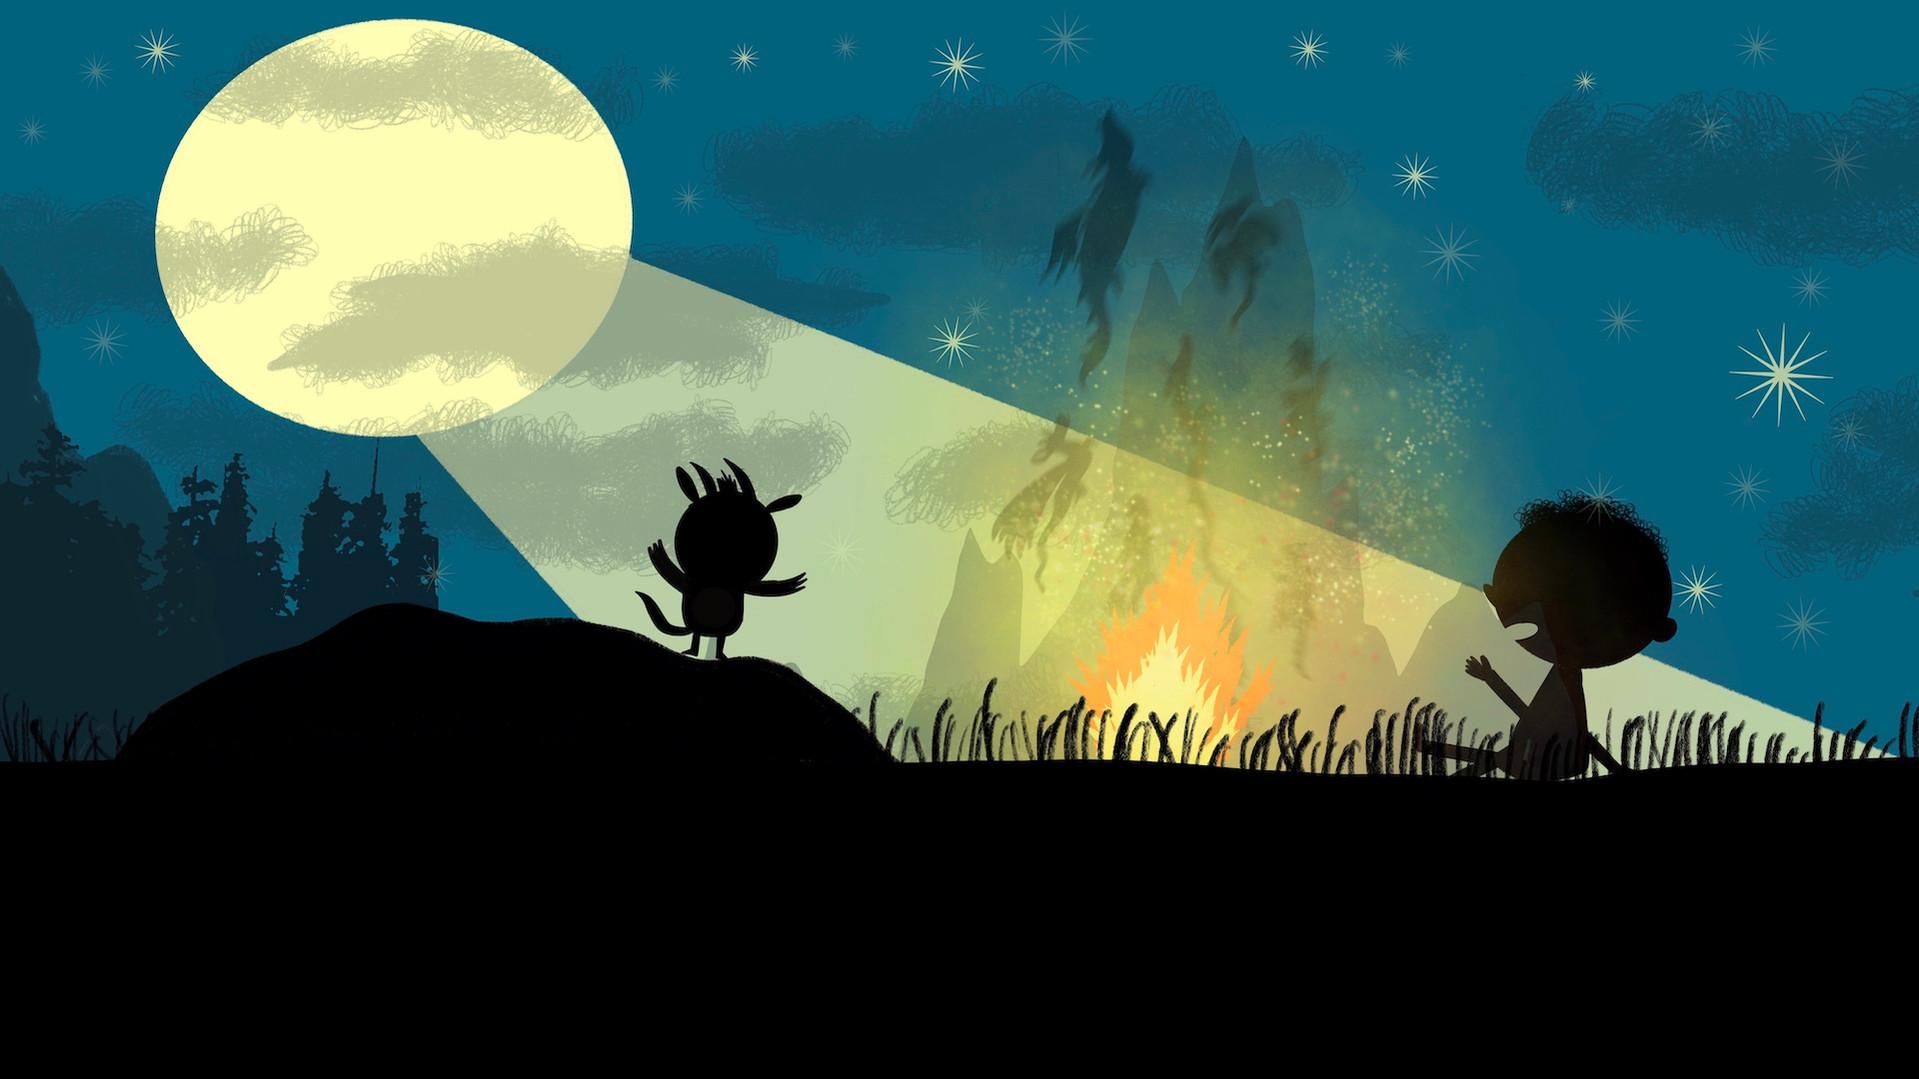 Nighttime Dragon Page 7-sweetland.jpeg